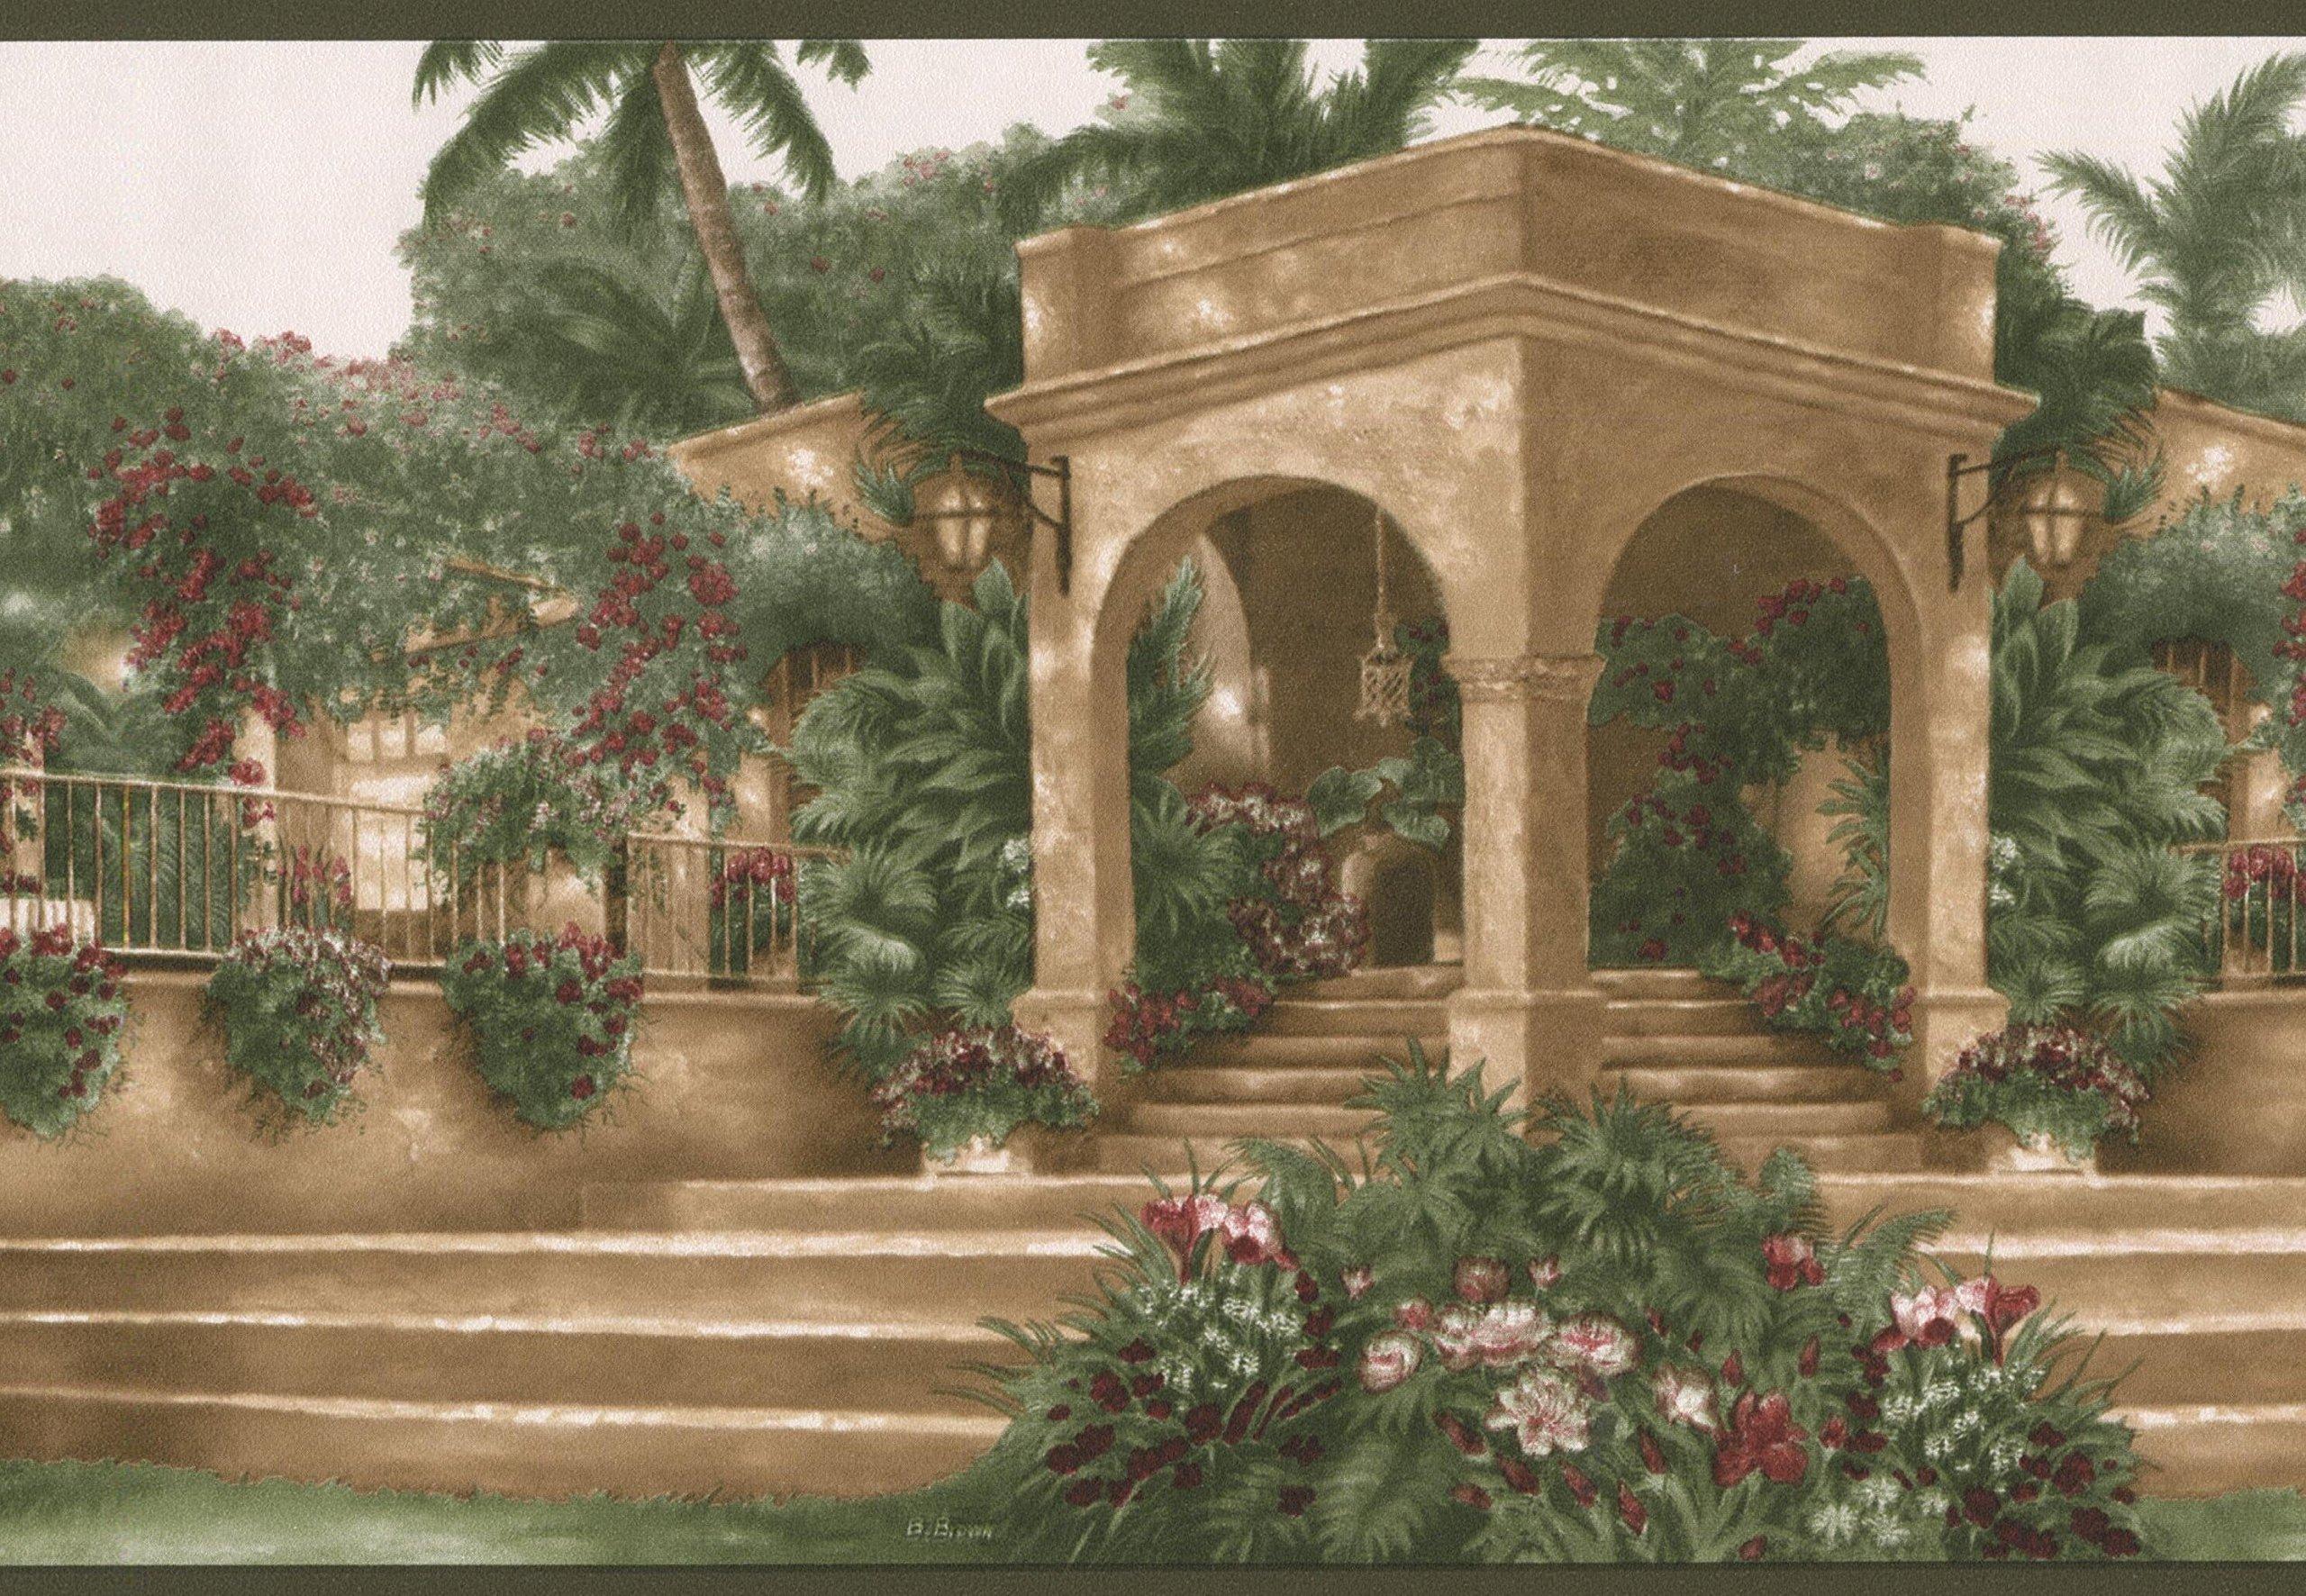 Mediterranean Palm Trees Flowers Villa Vintage Wallpaper Border Retro Design, Roll 15' x 7''